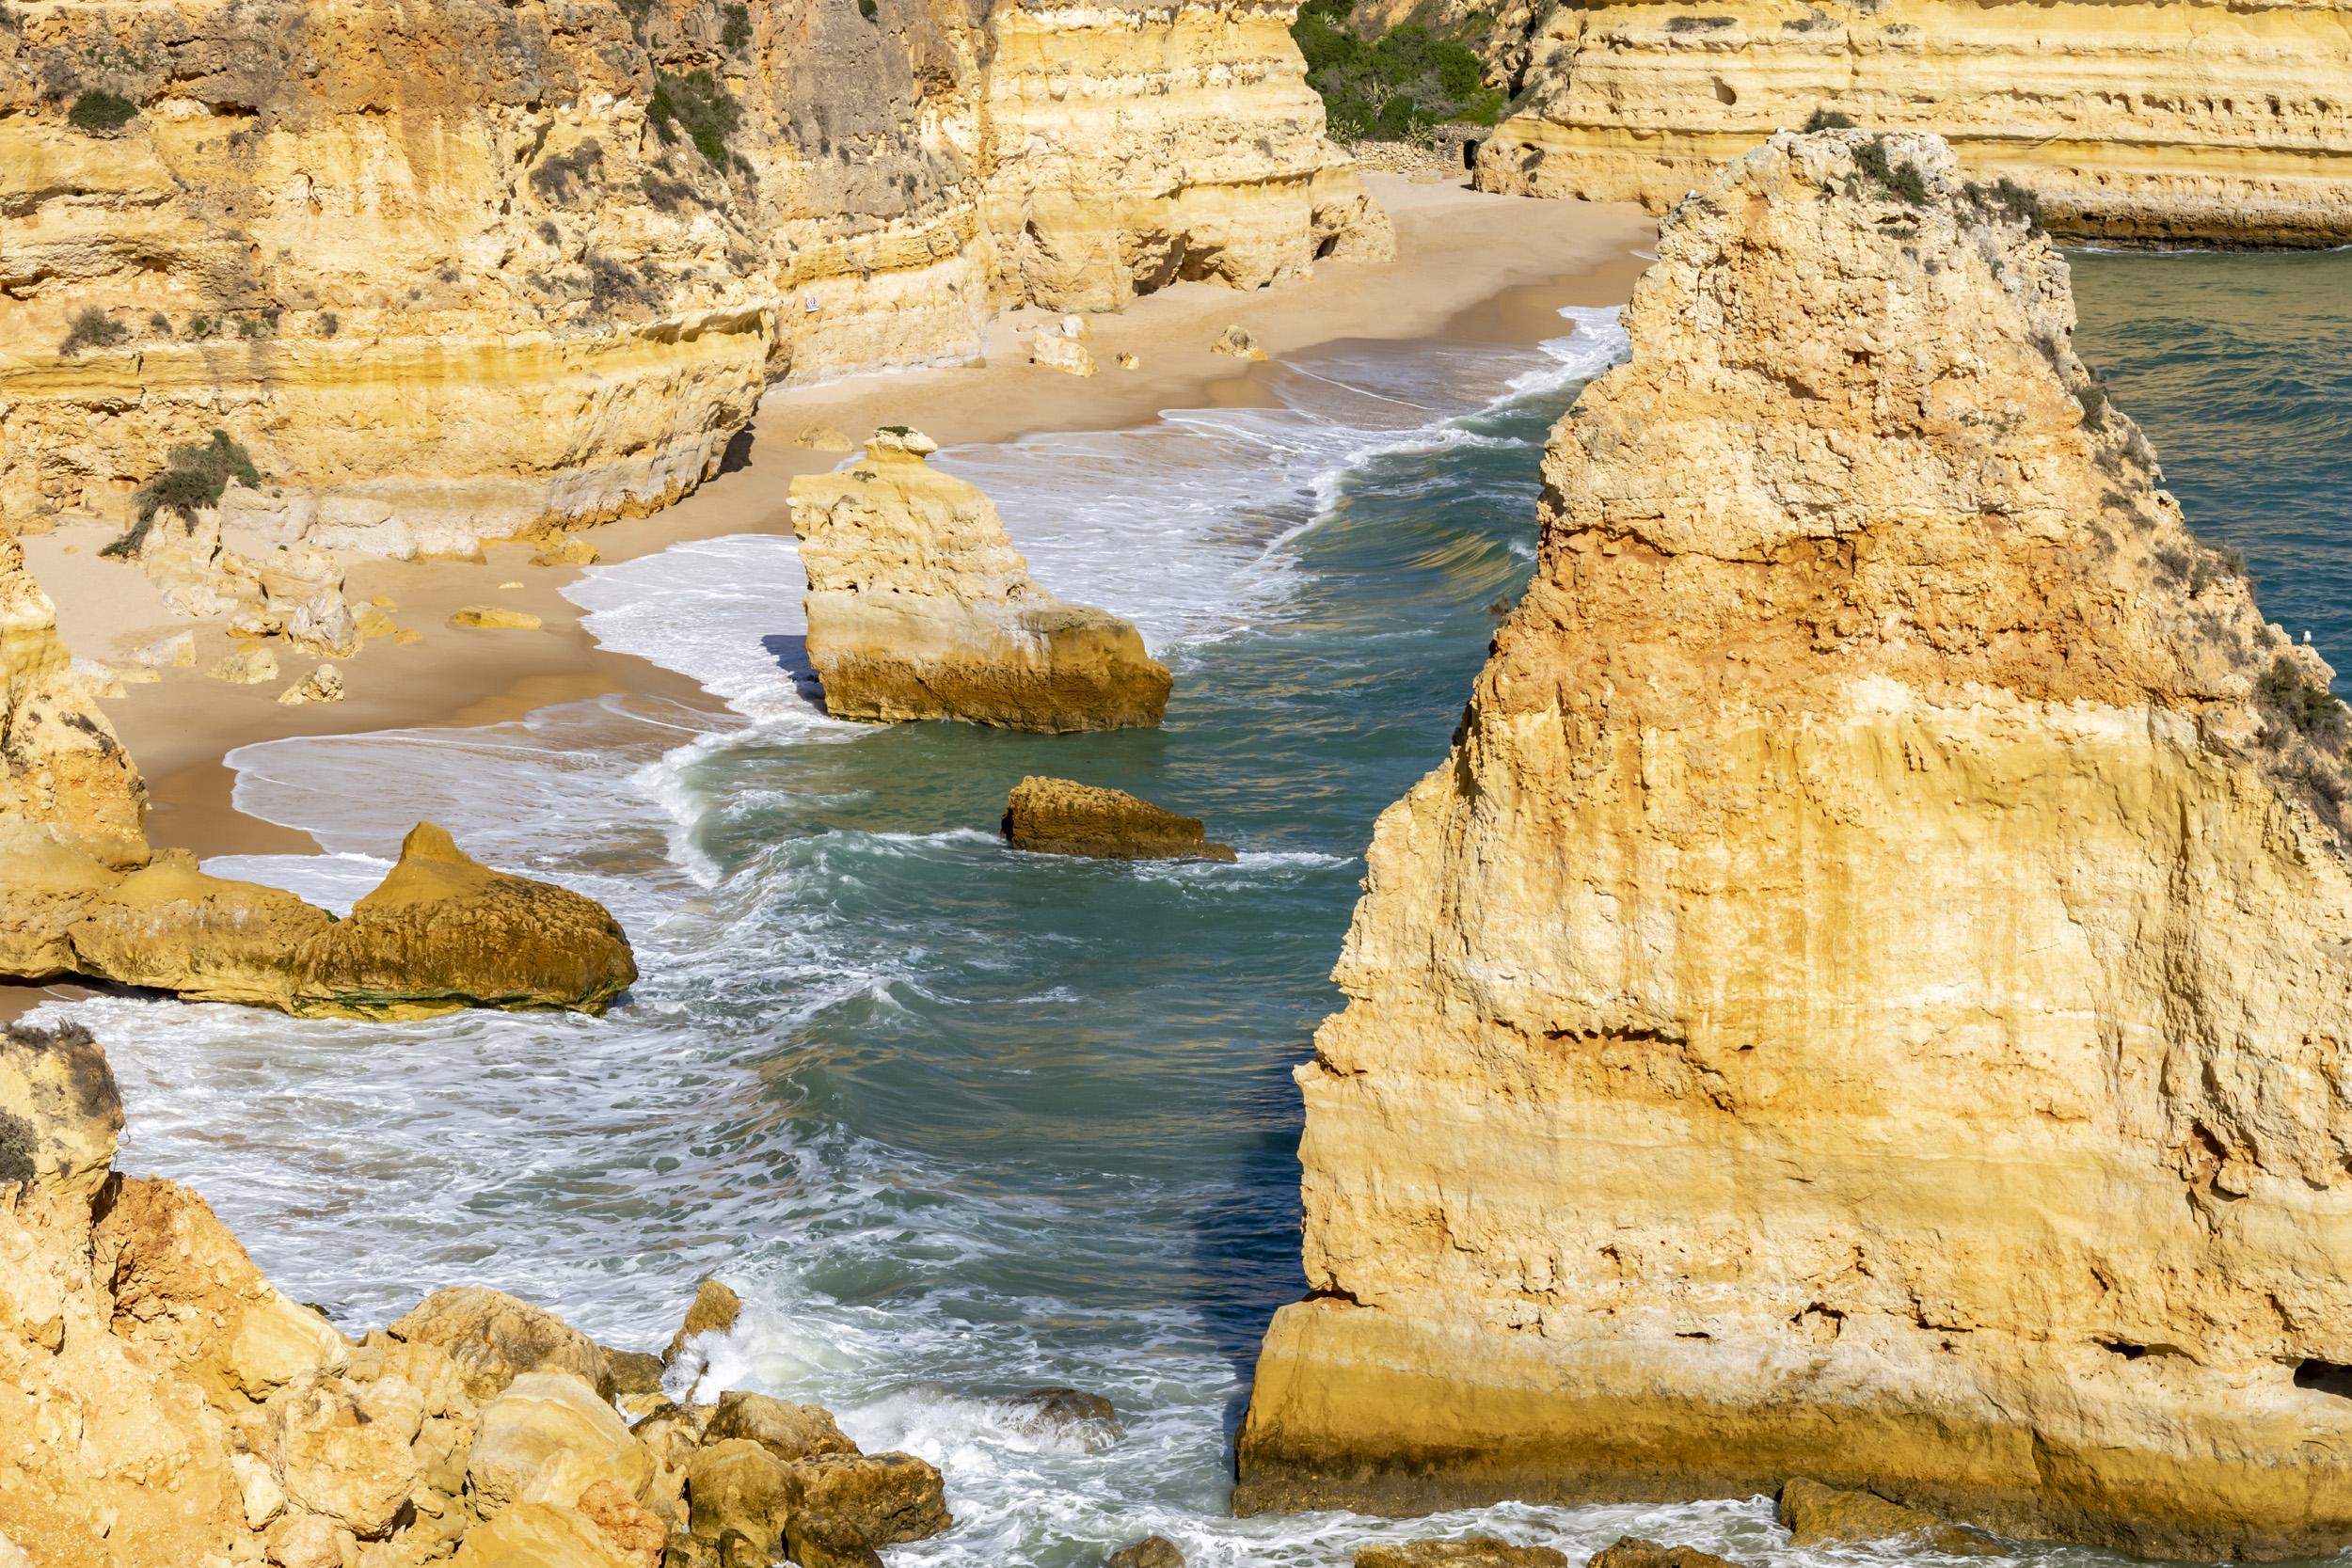 Praia de Dona Ana Rocks